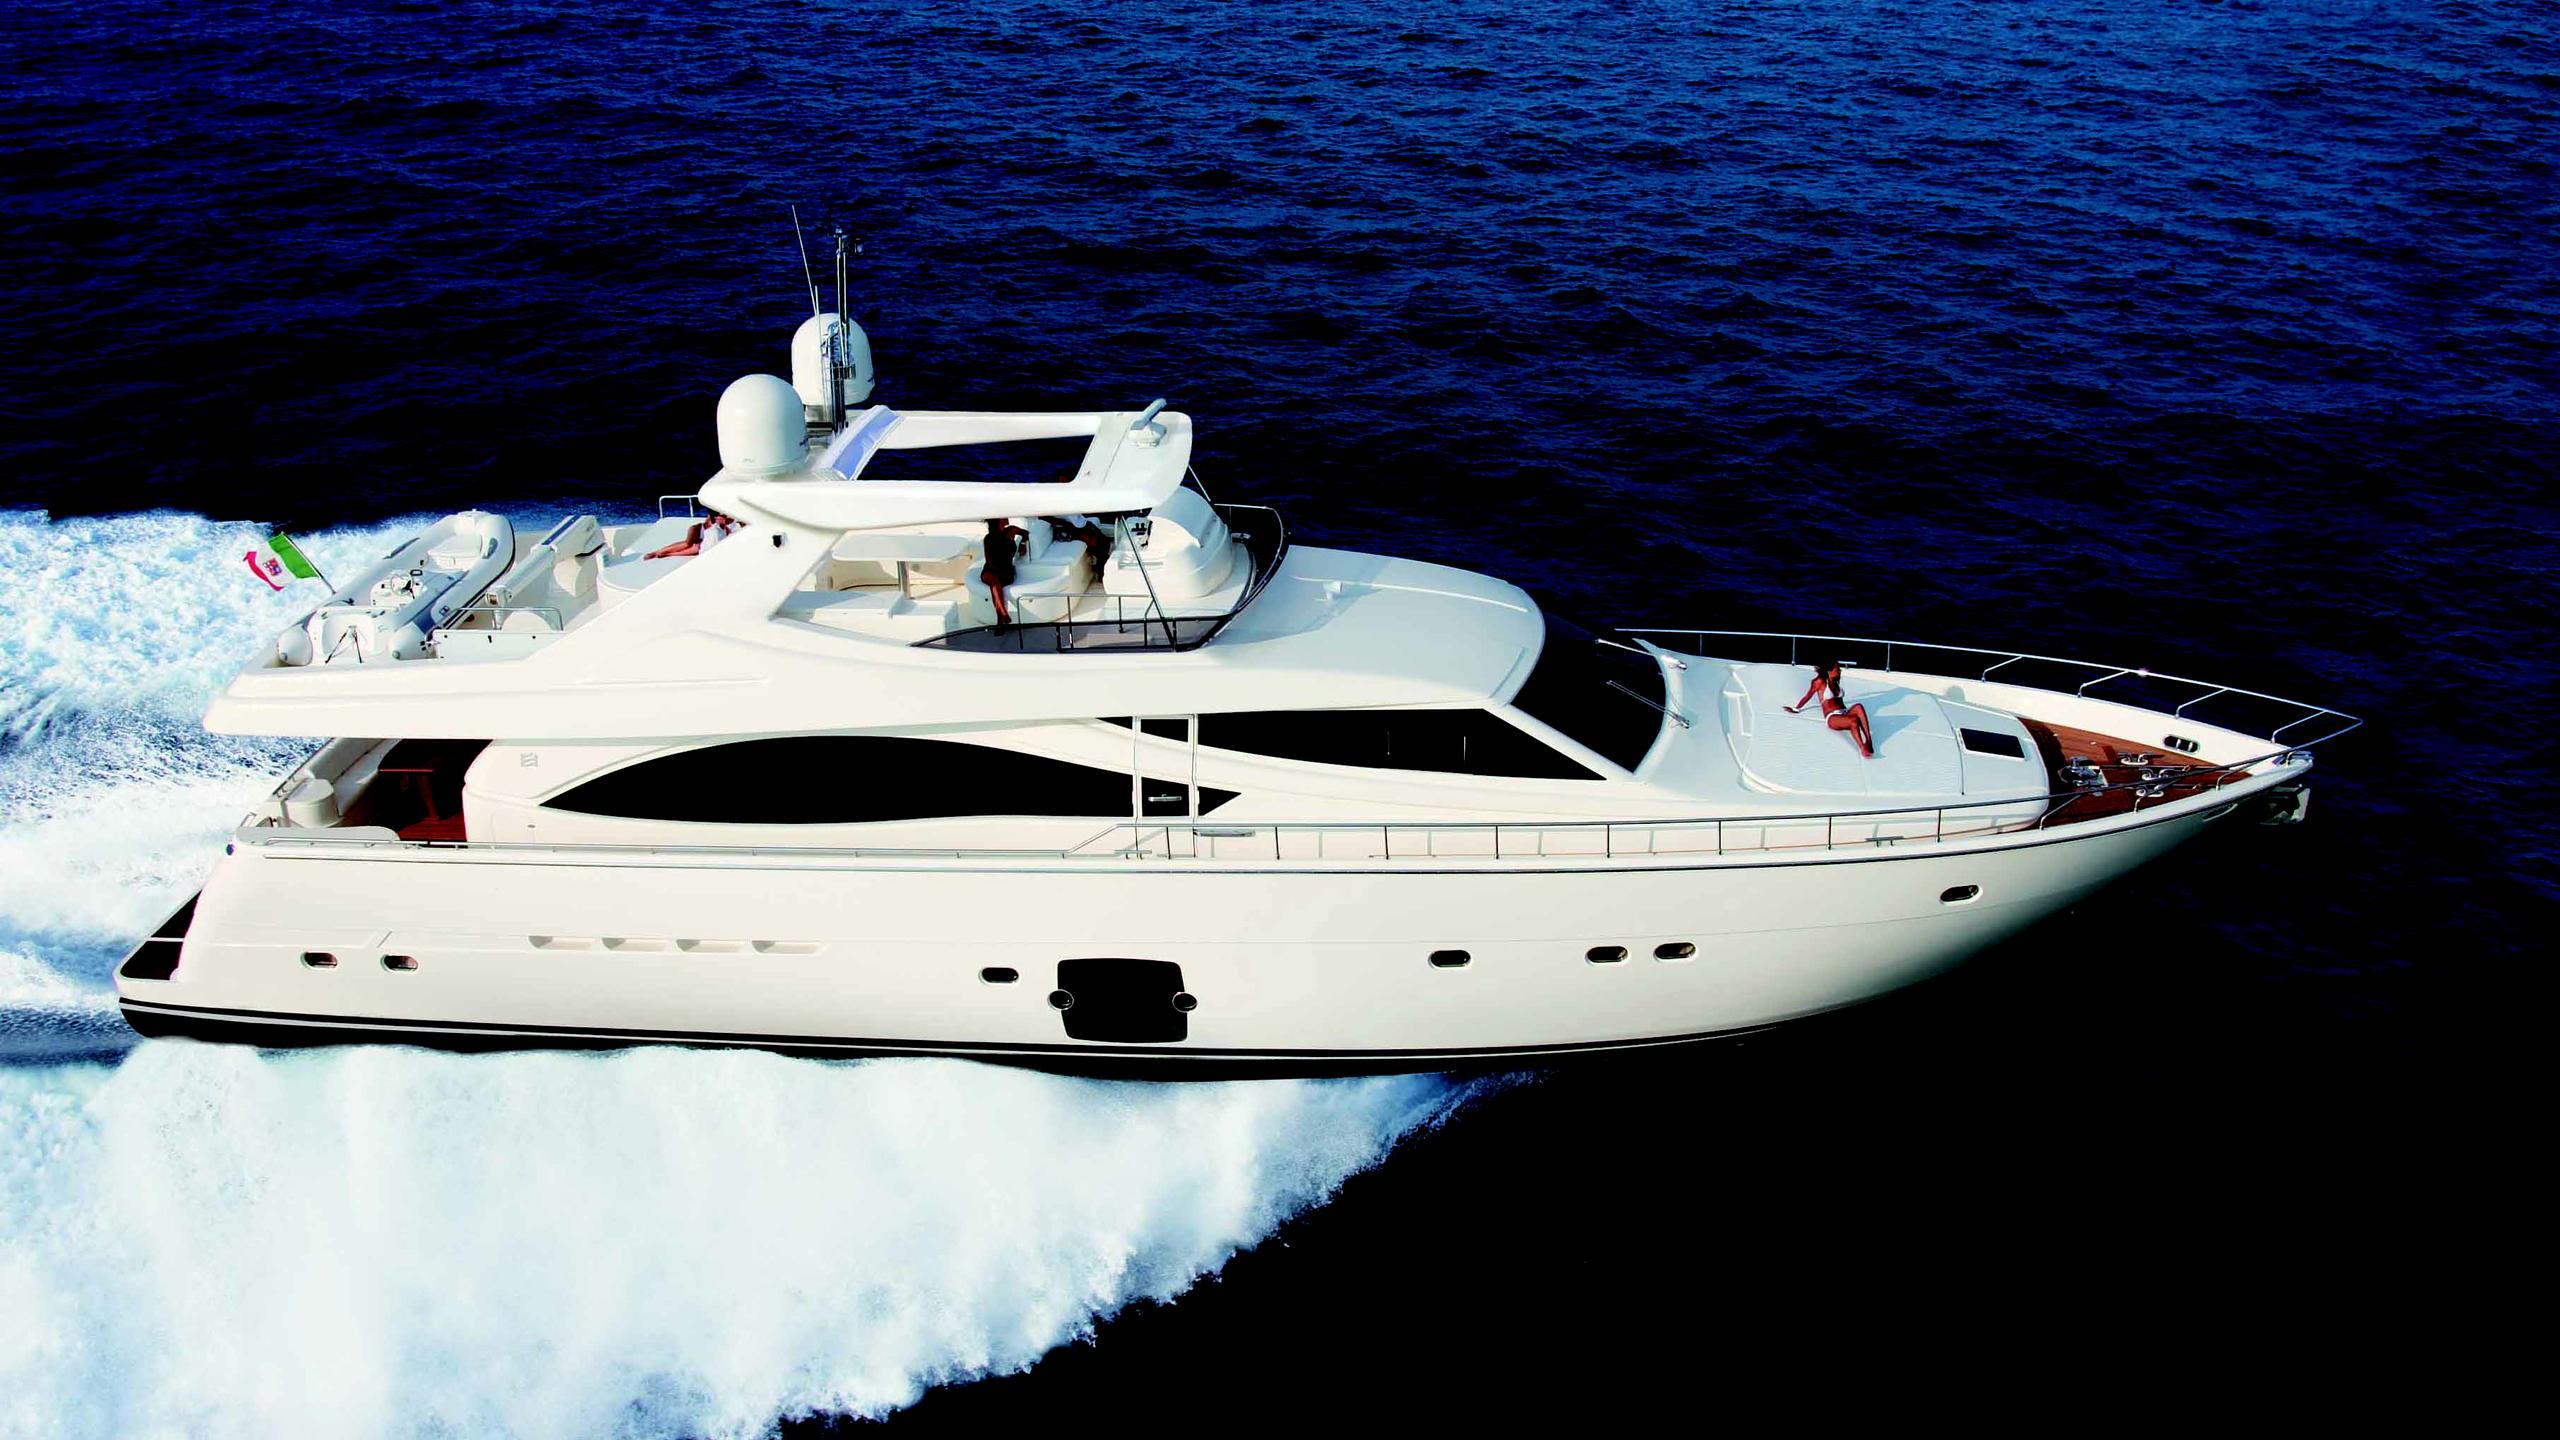 ferretti-830-12-motor-yacht-2005-25m-cruising